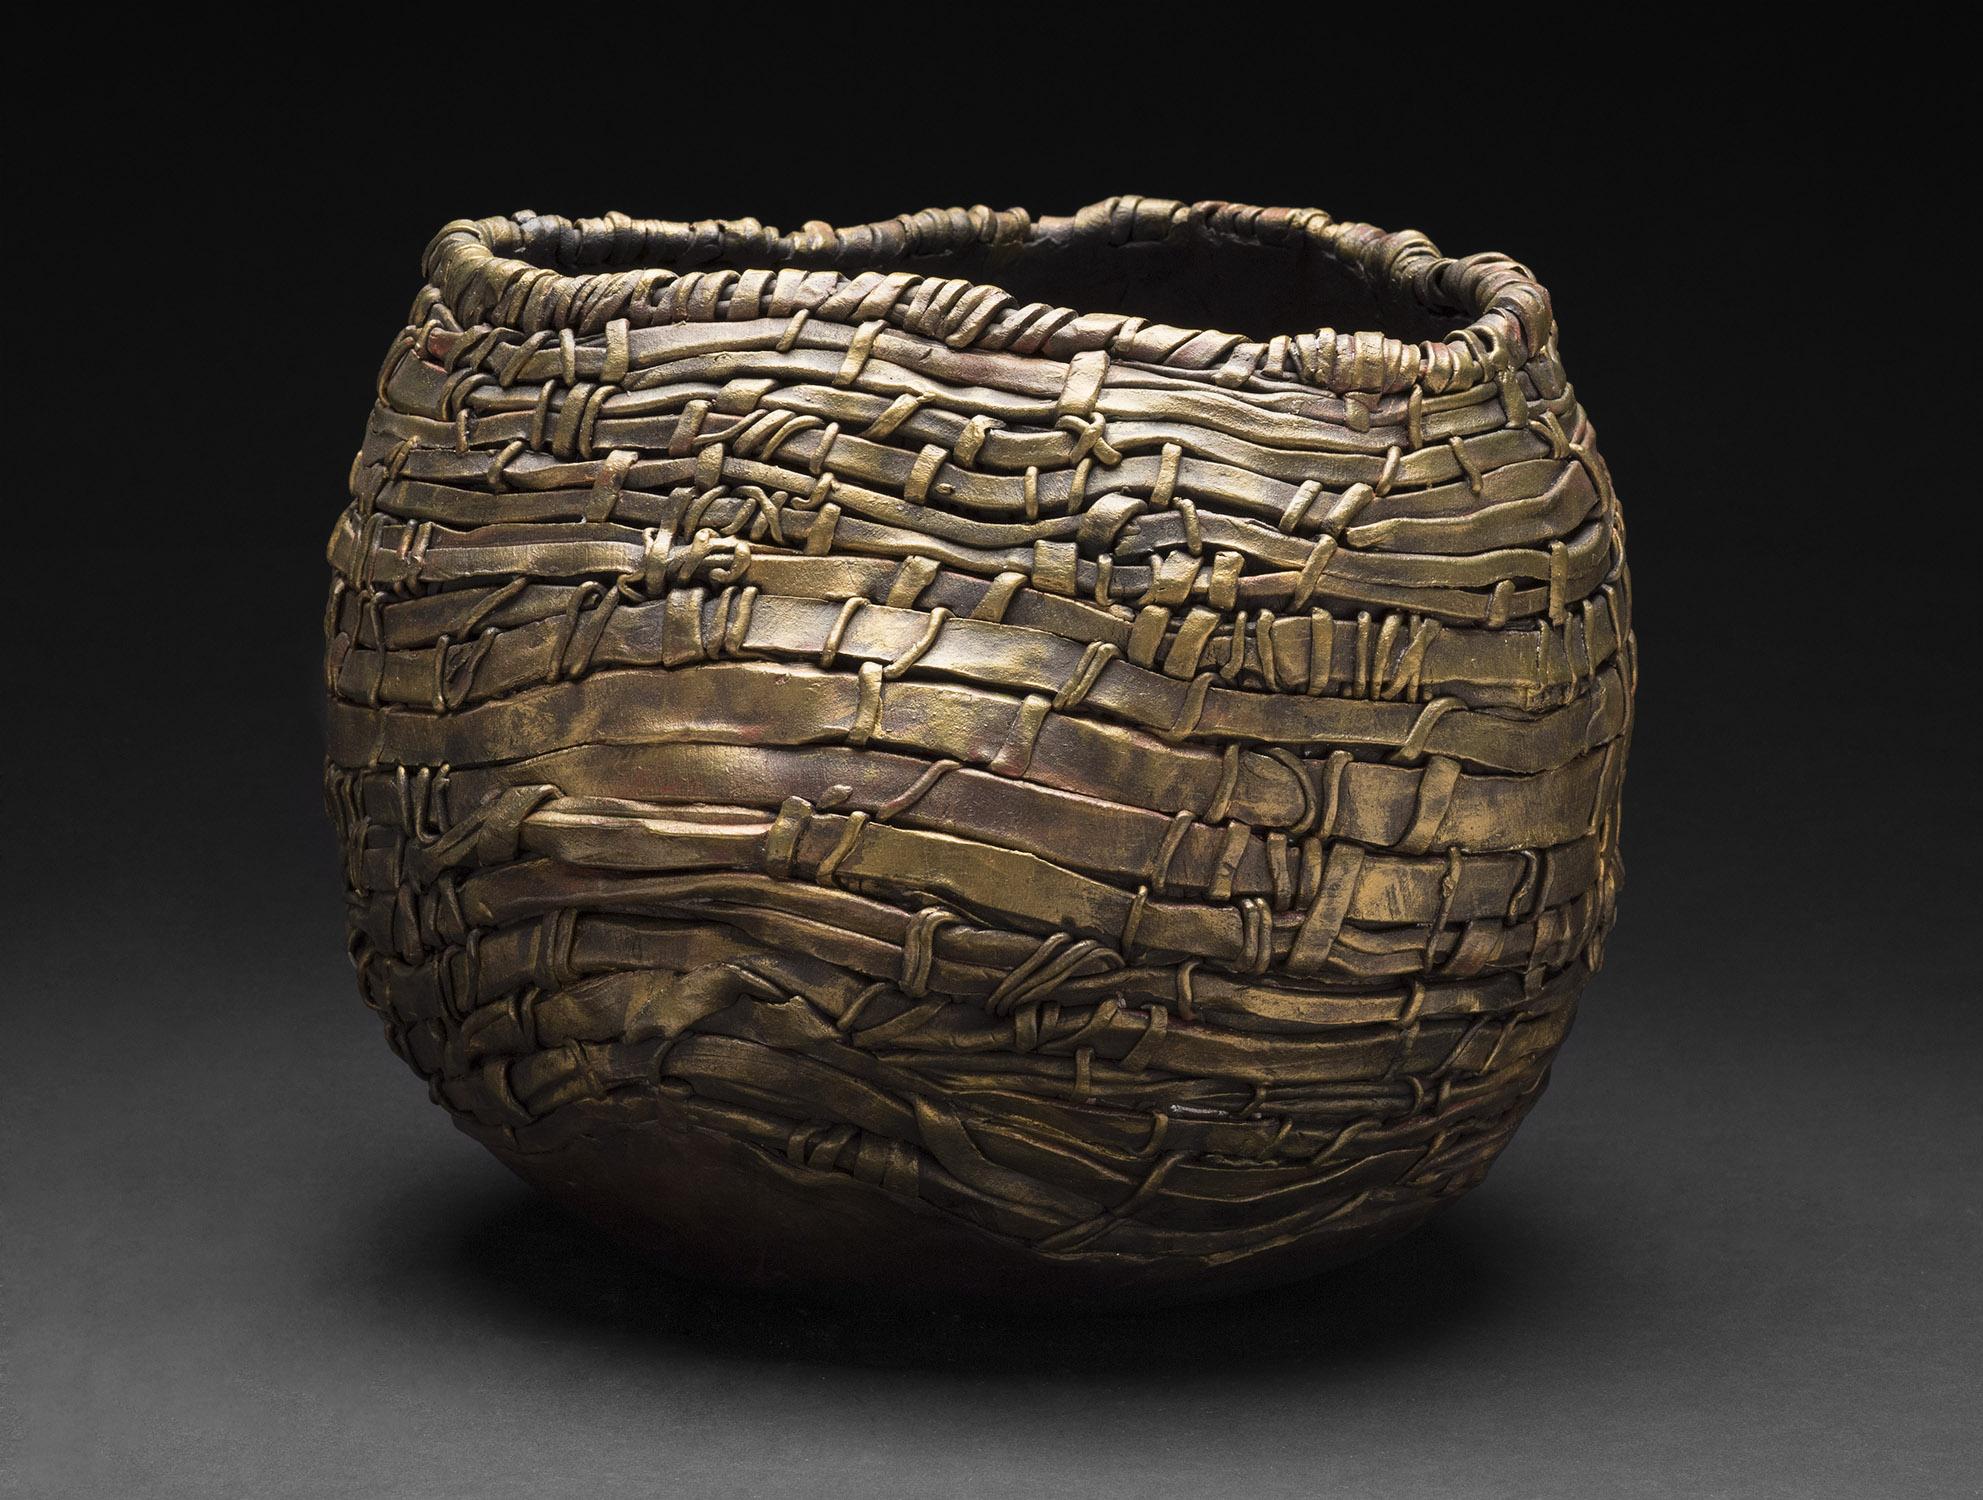 Susan Margin    Solitude  , 2012 Woven clay, metallic finishes 9 x 10 x 10 inches 22.9 x 25.4 x 25.4 cm SMrg 3